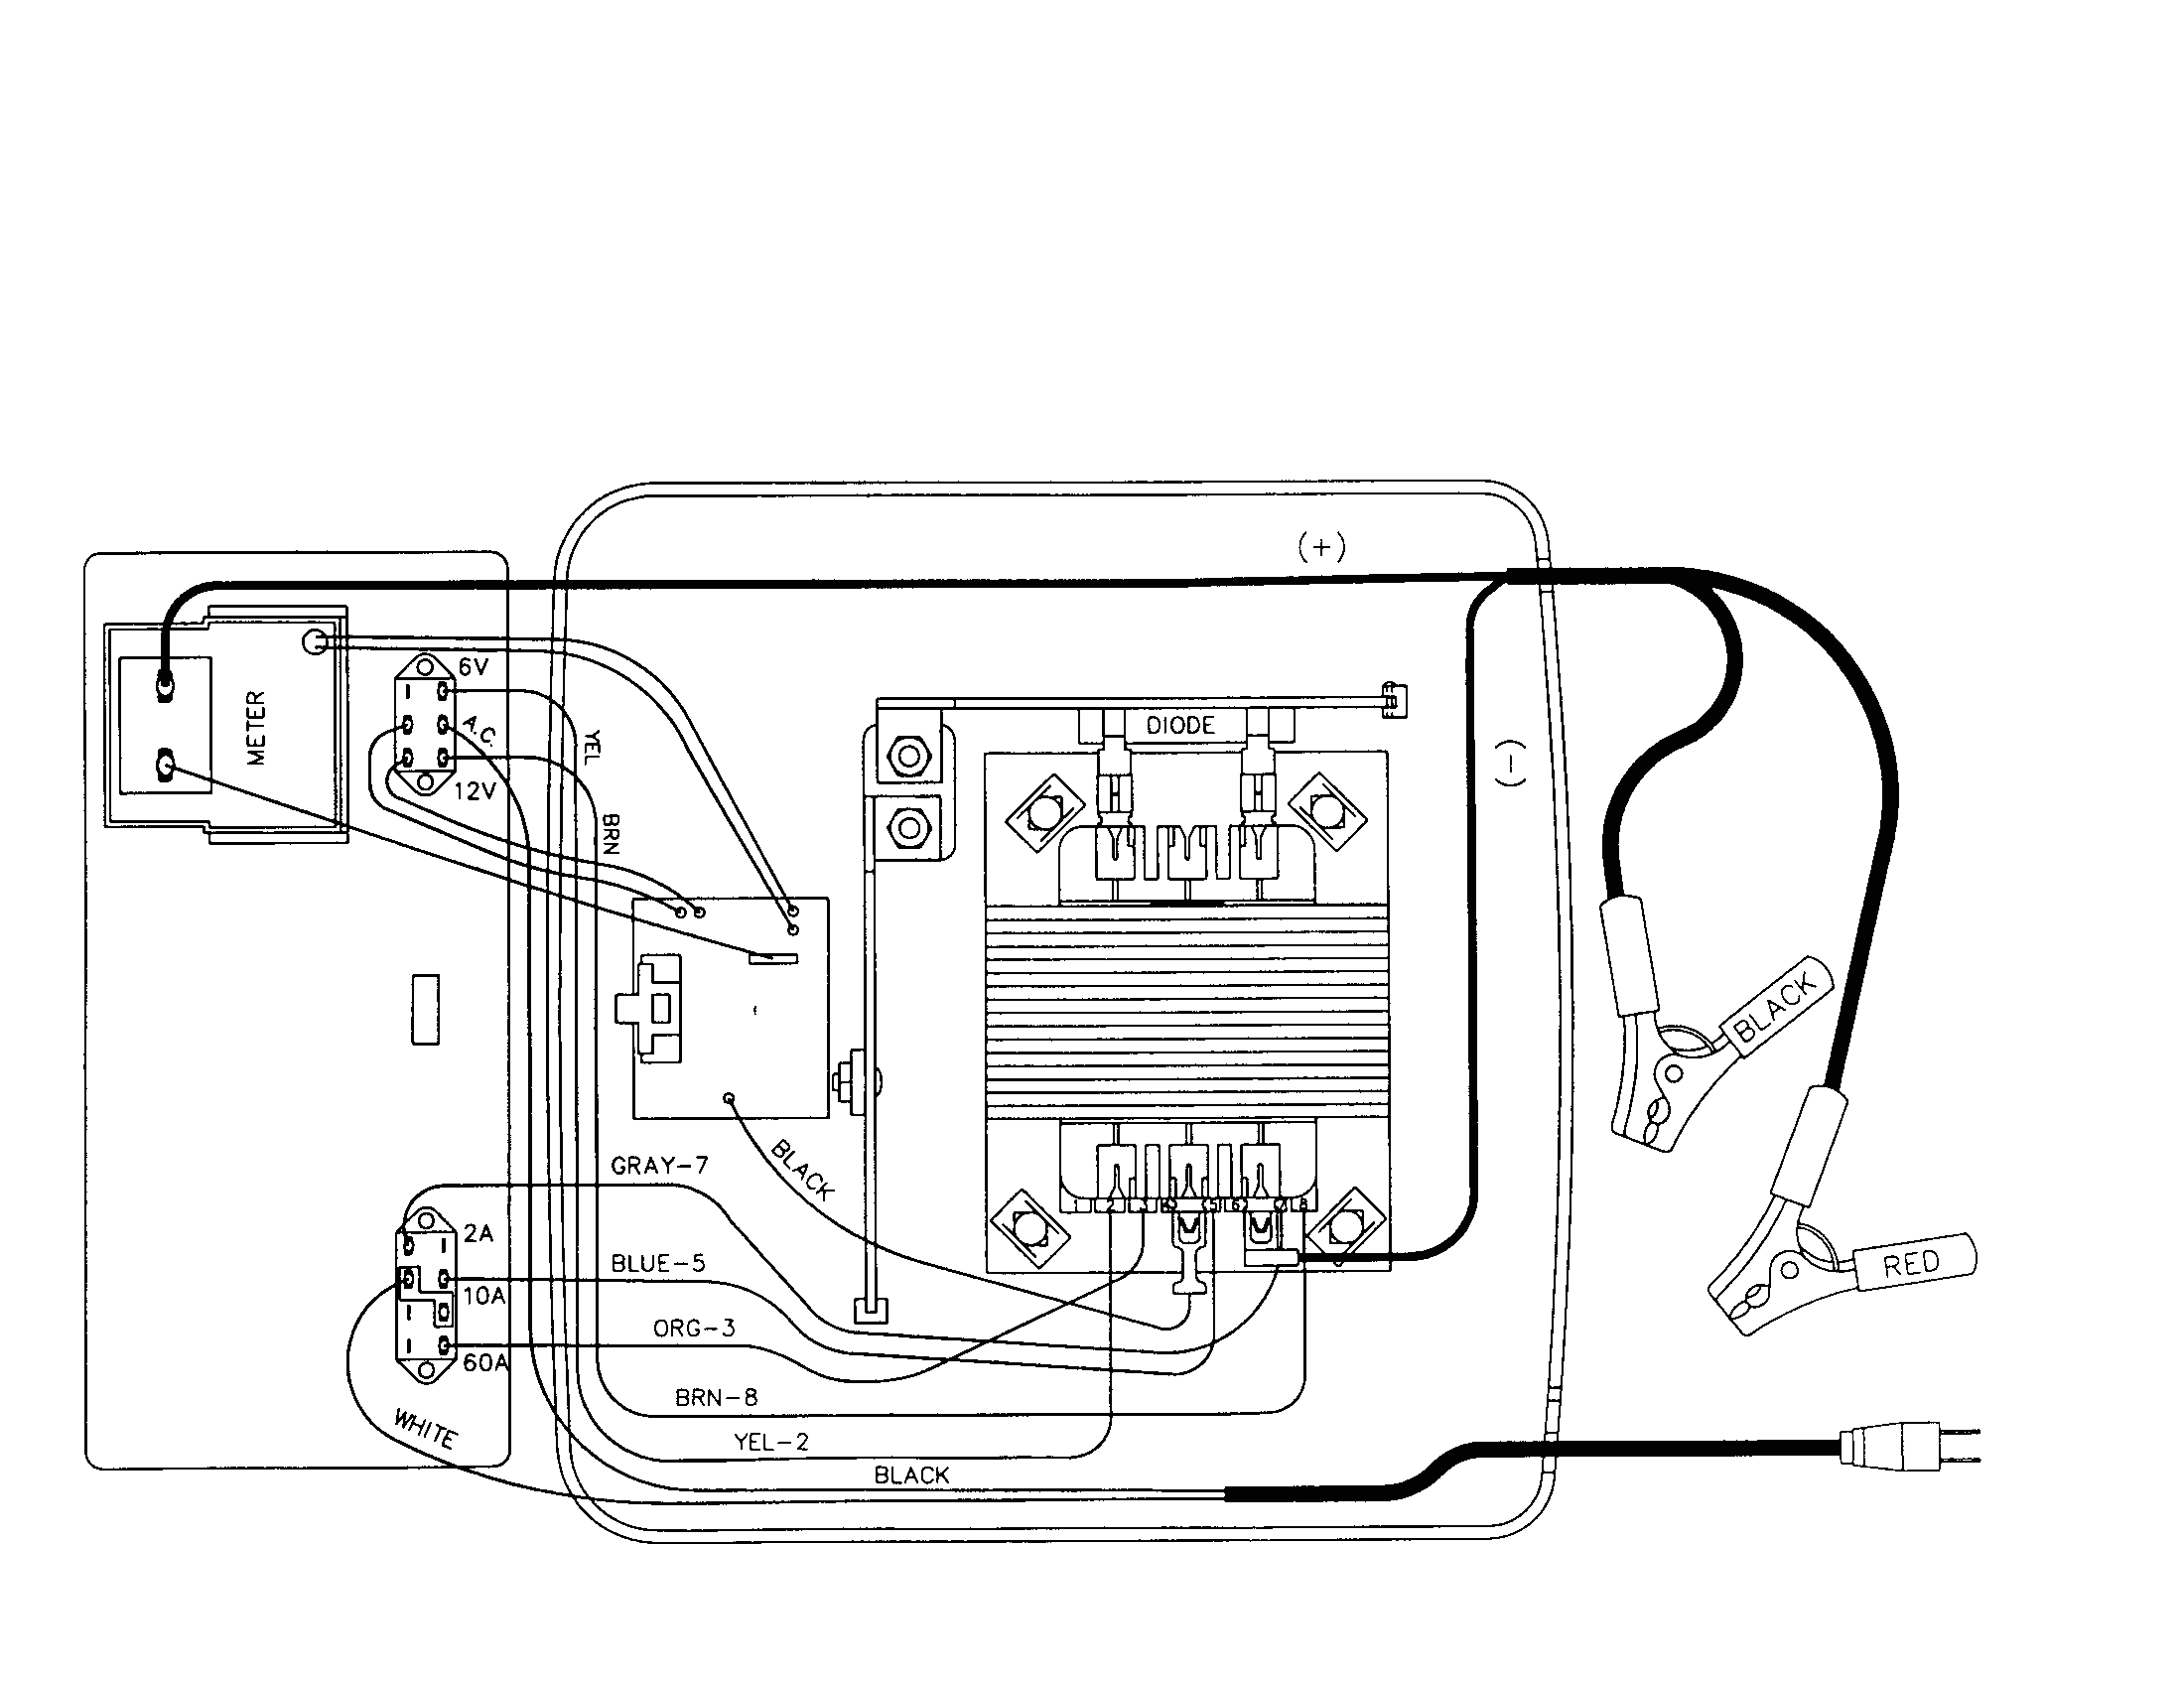 battery wiring diagrams new schumacher battery charger wiring diagram scwam battery charger of battery wiring diagrams png